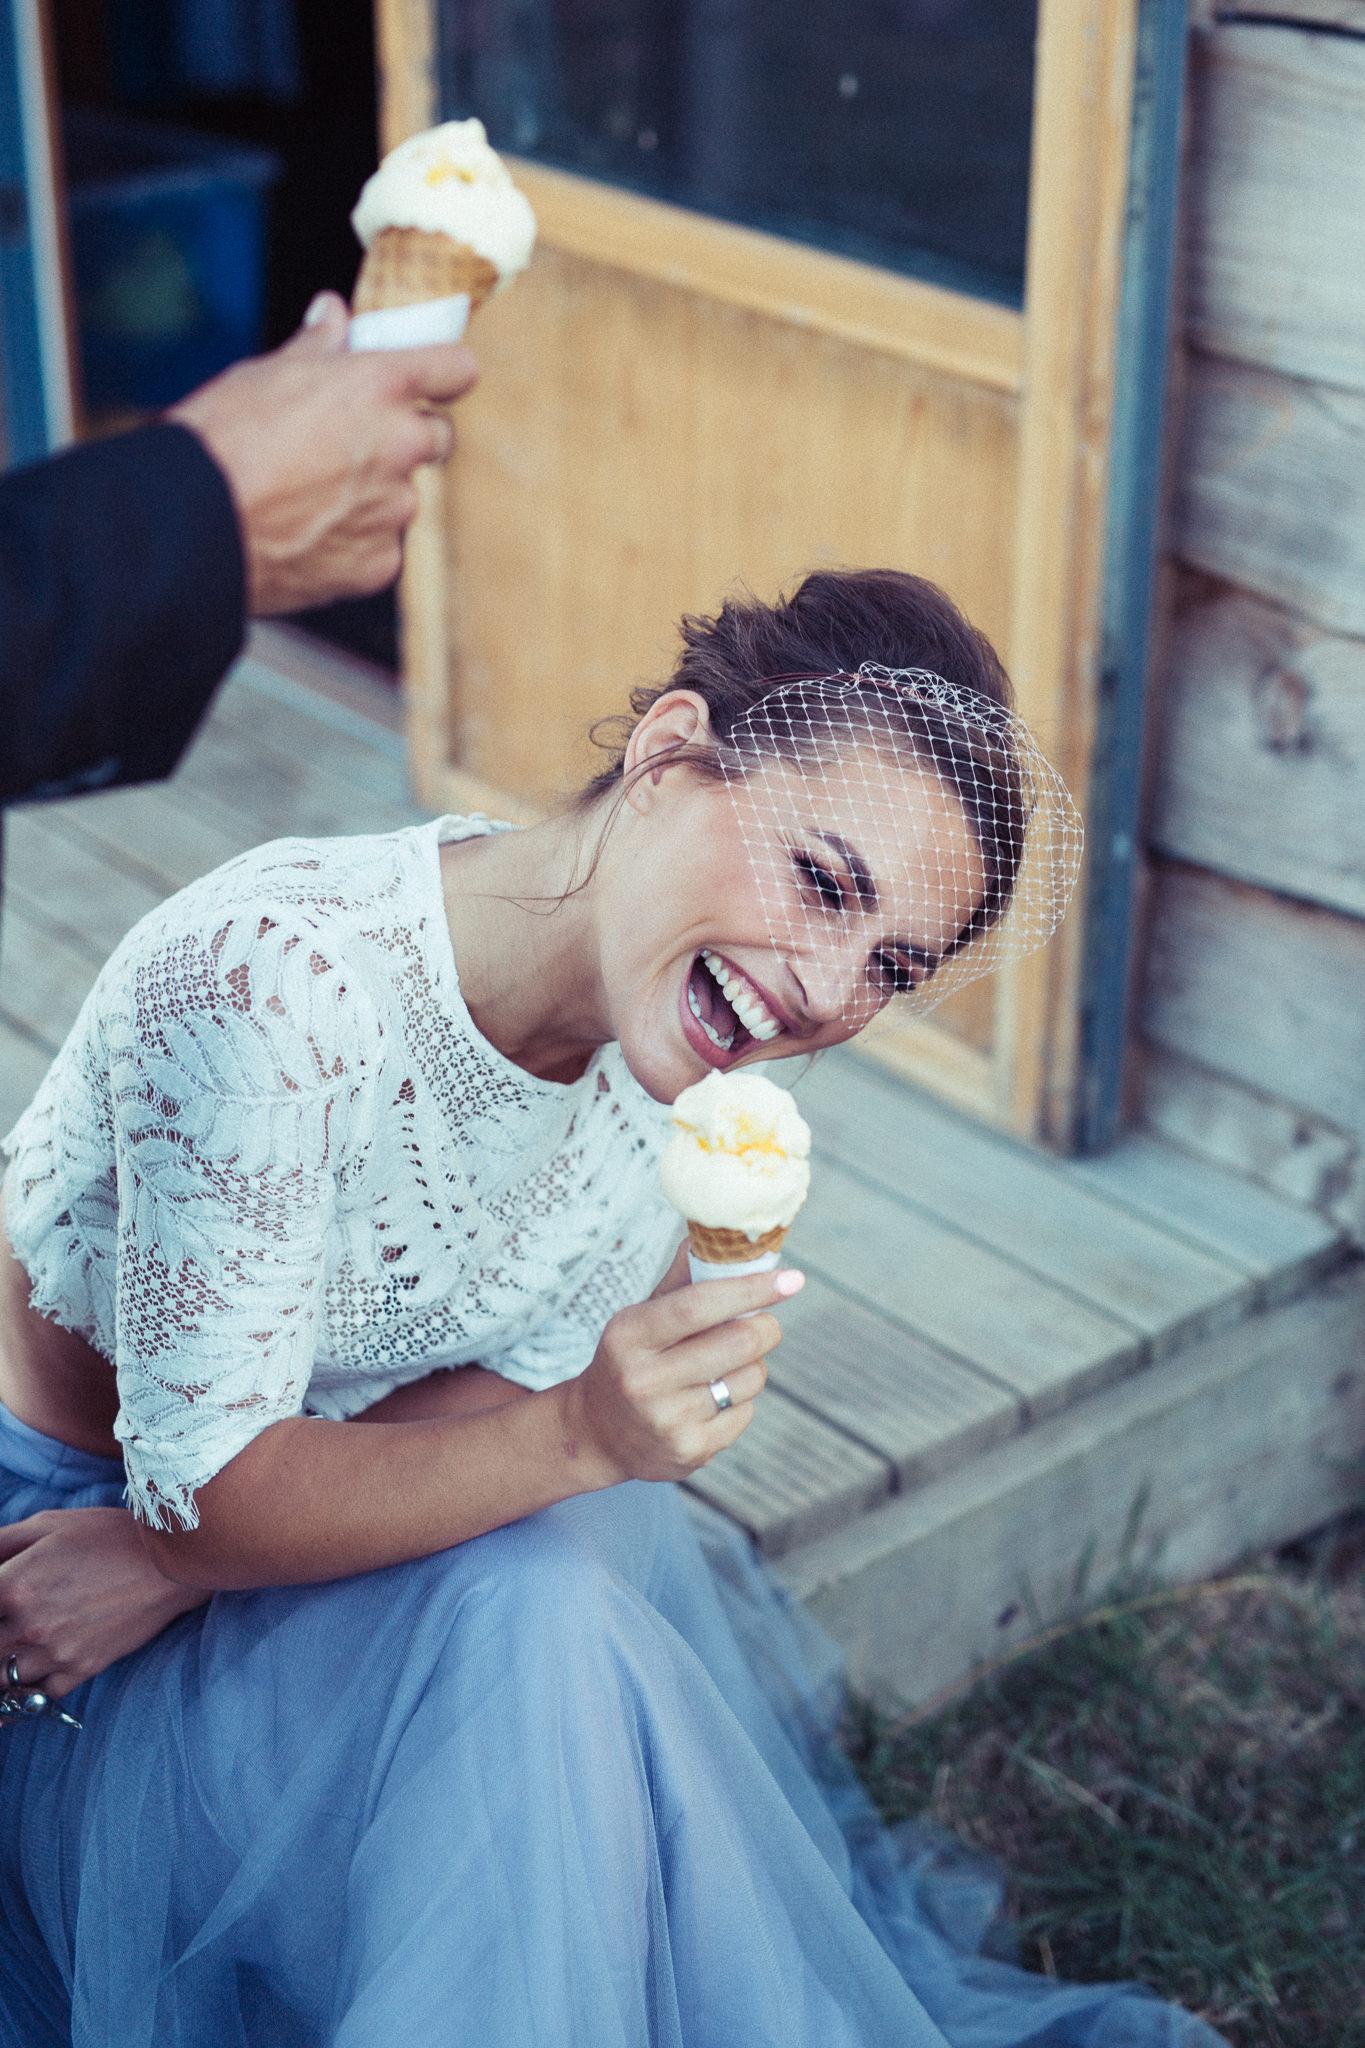 Happy bride with ice cream | Image courtesy of Adj Brown